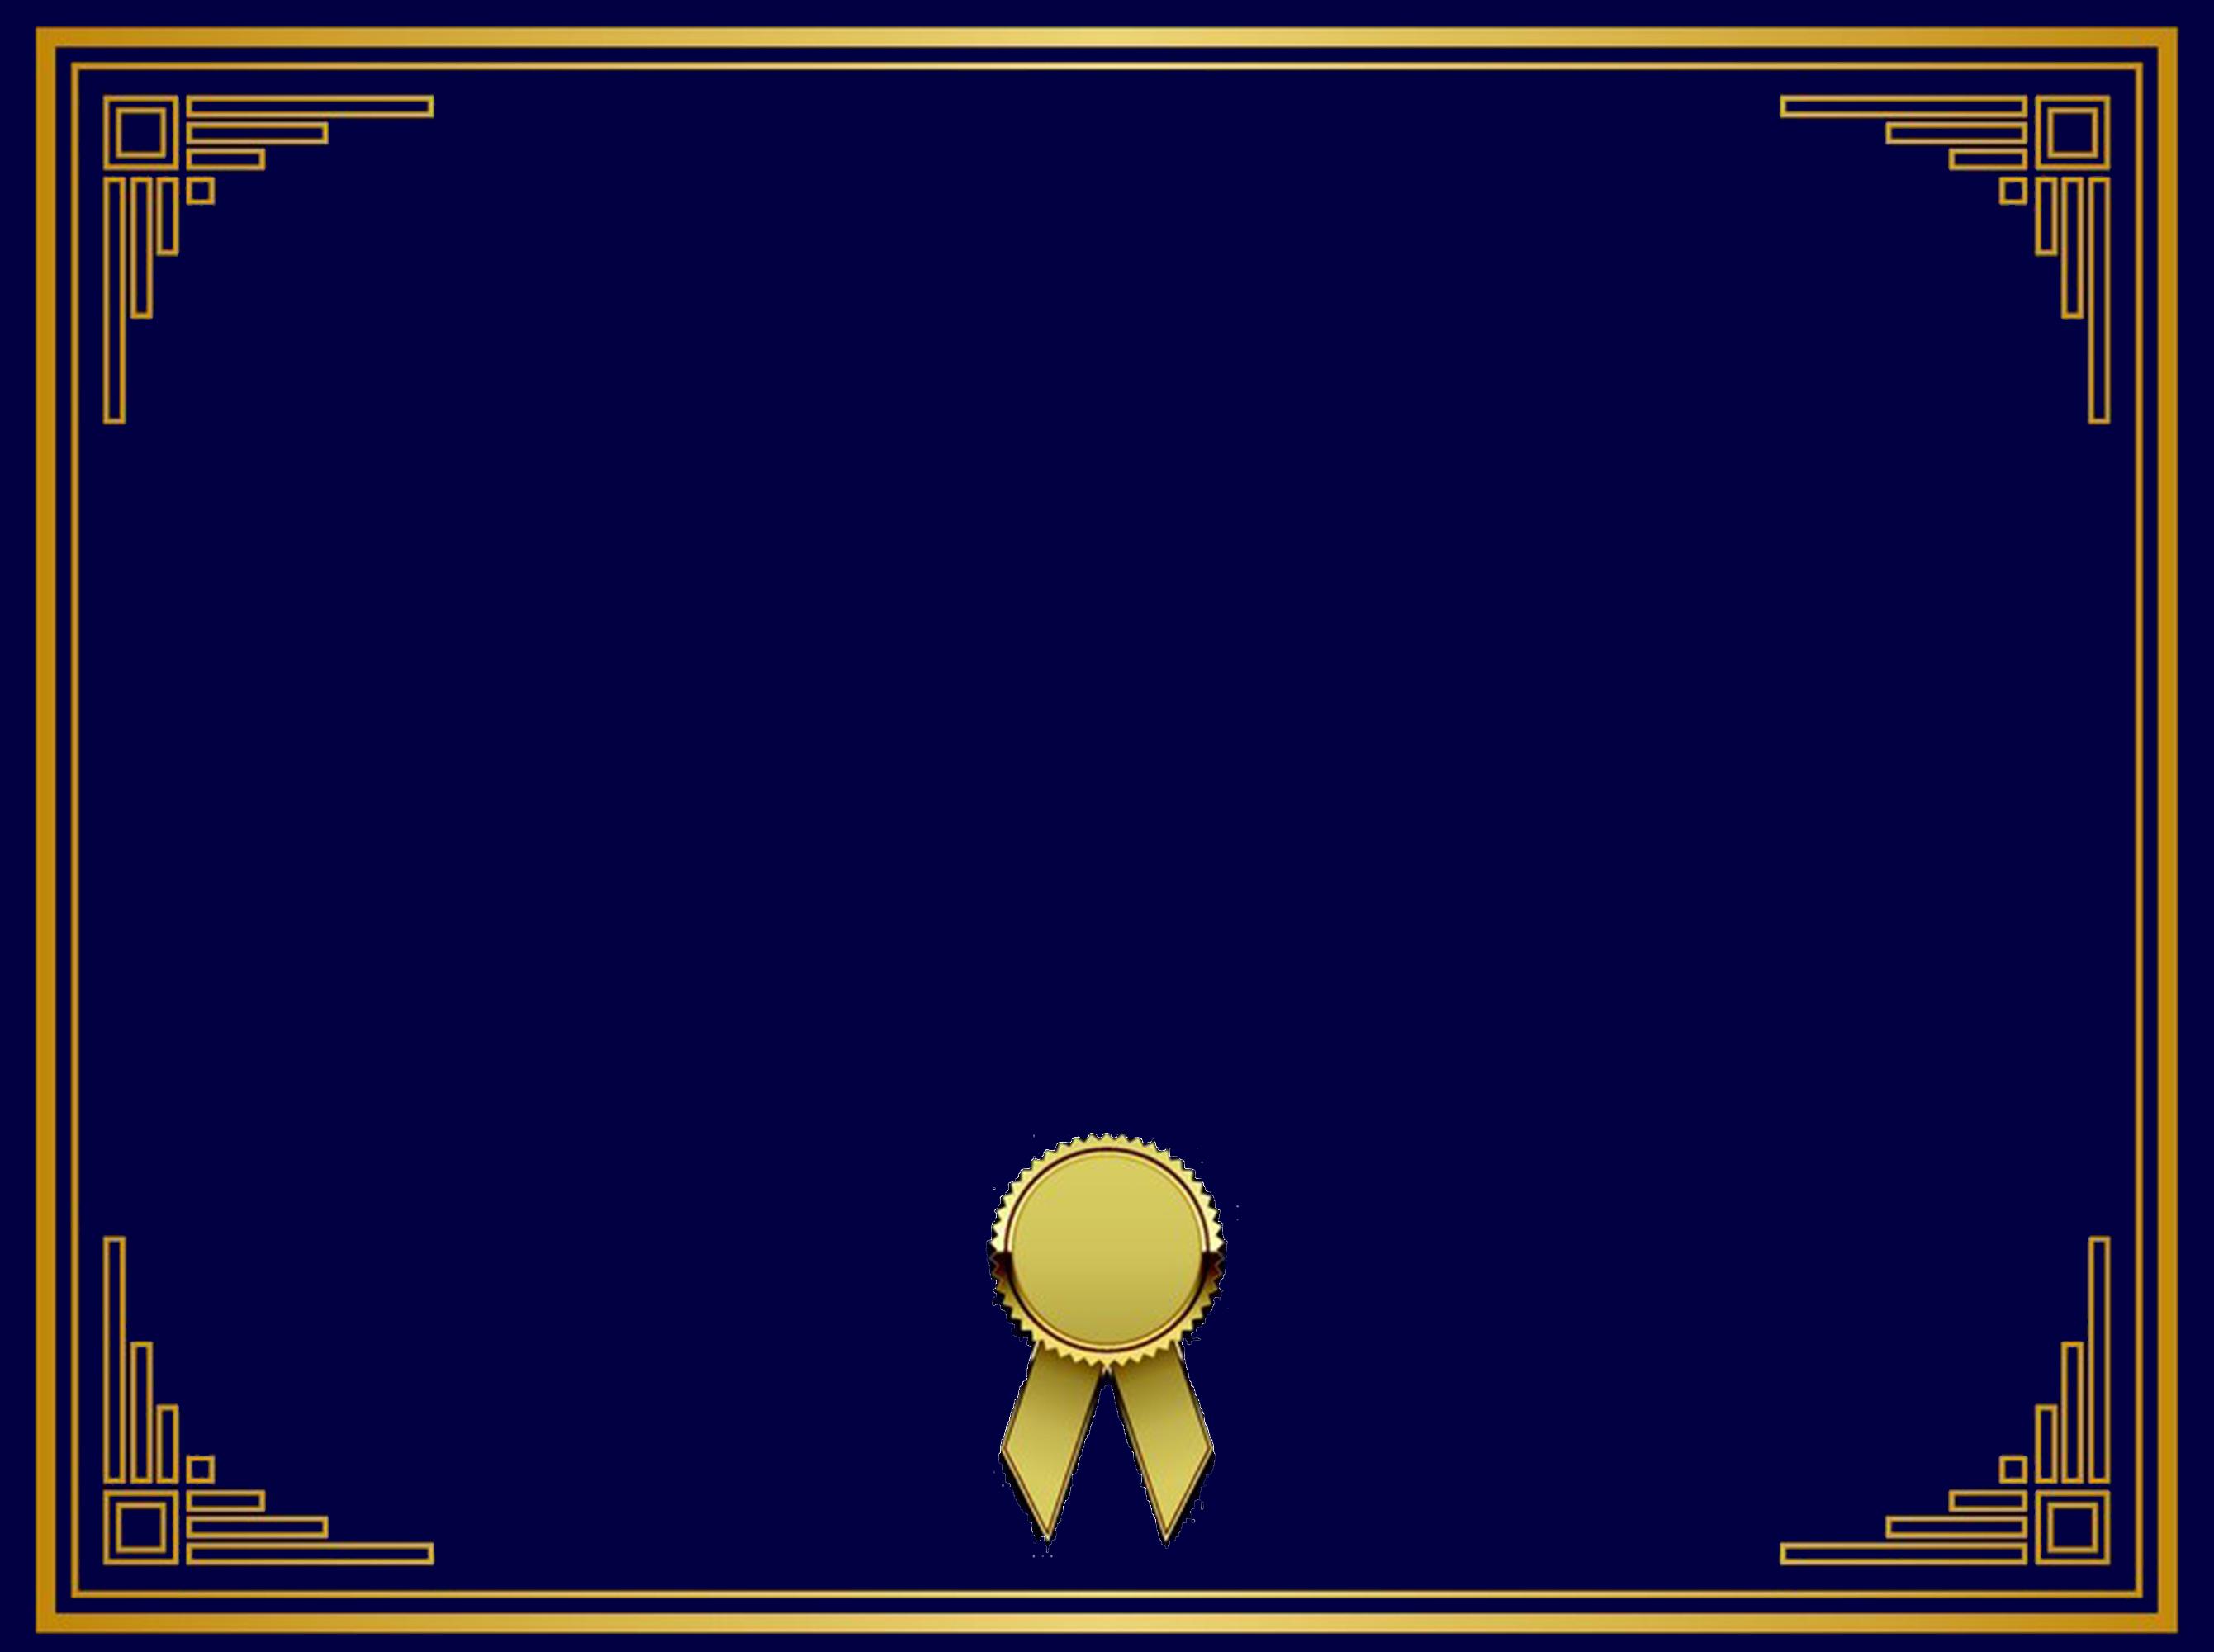 or  la bordure de fond en mati u00e8re de certificats bleu fonc u00e9  cadre d u0026 39 or  bleu fonc u00e9 d u0026 39 ombrage